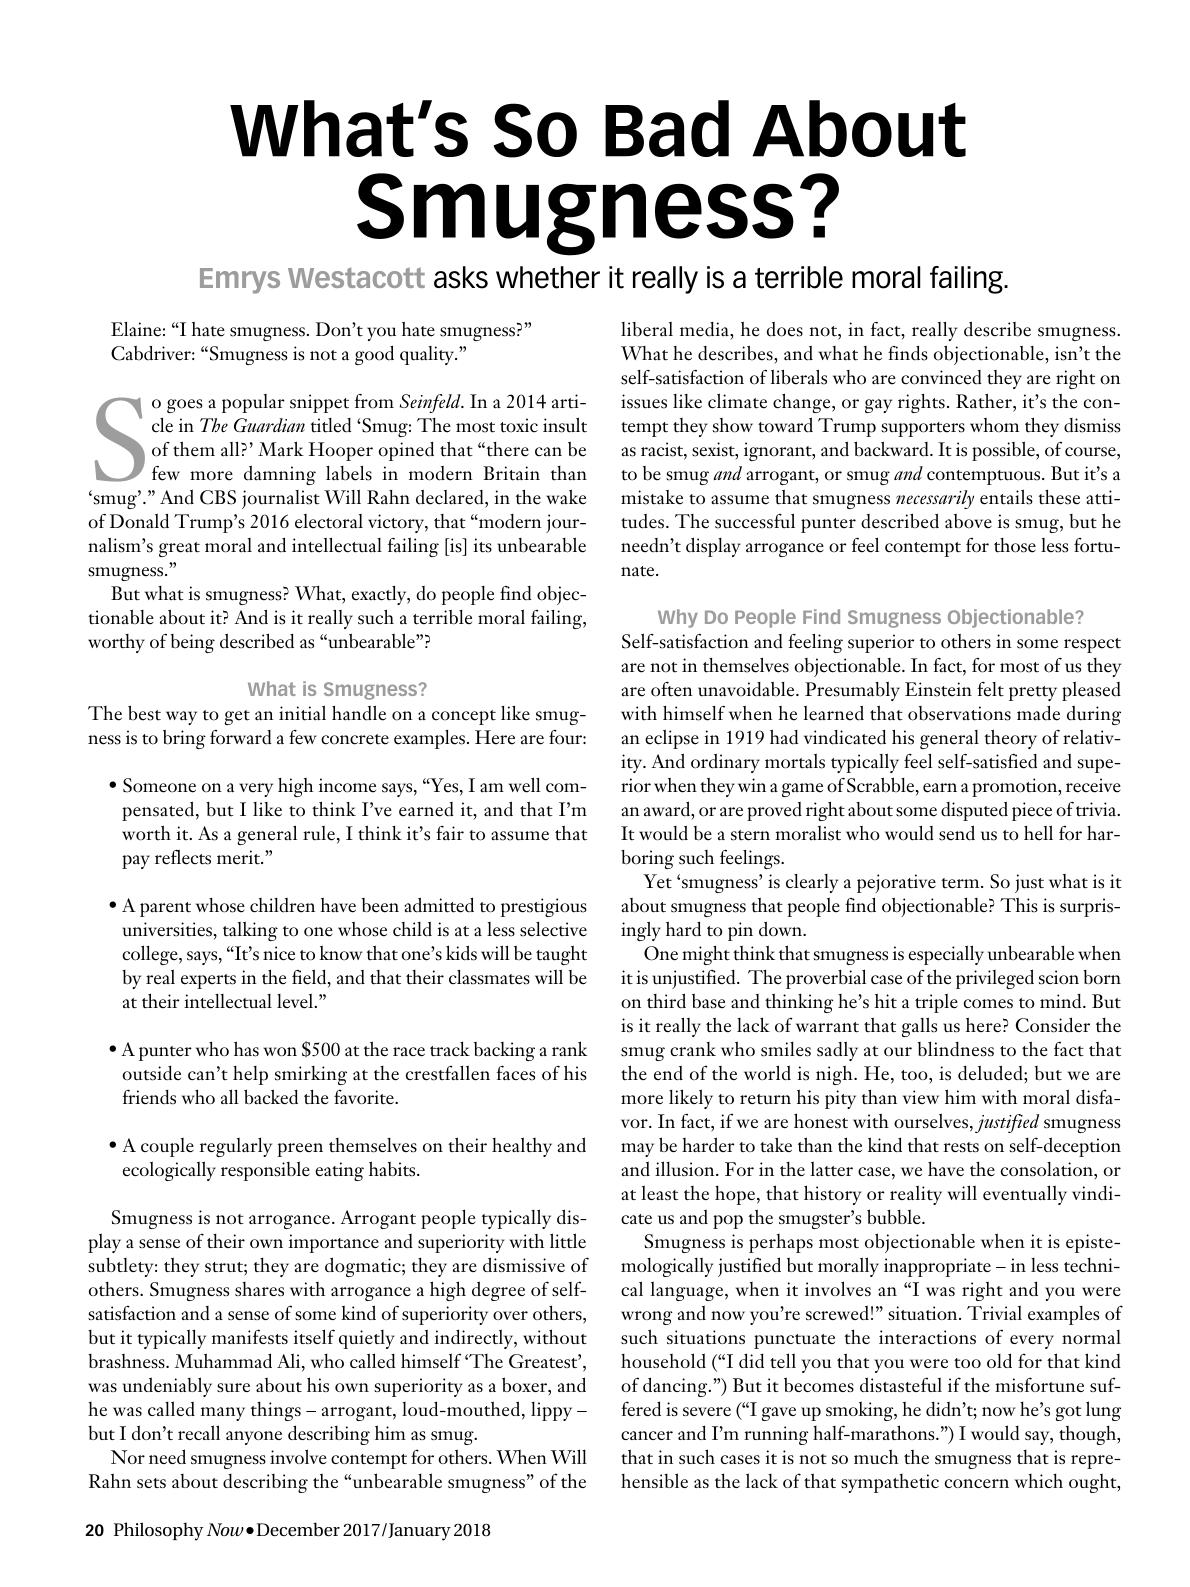 What's So Bad About Smugness? - Emrys Westacott - Philosophy